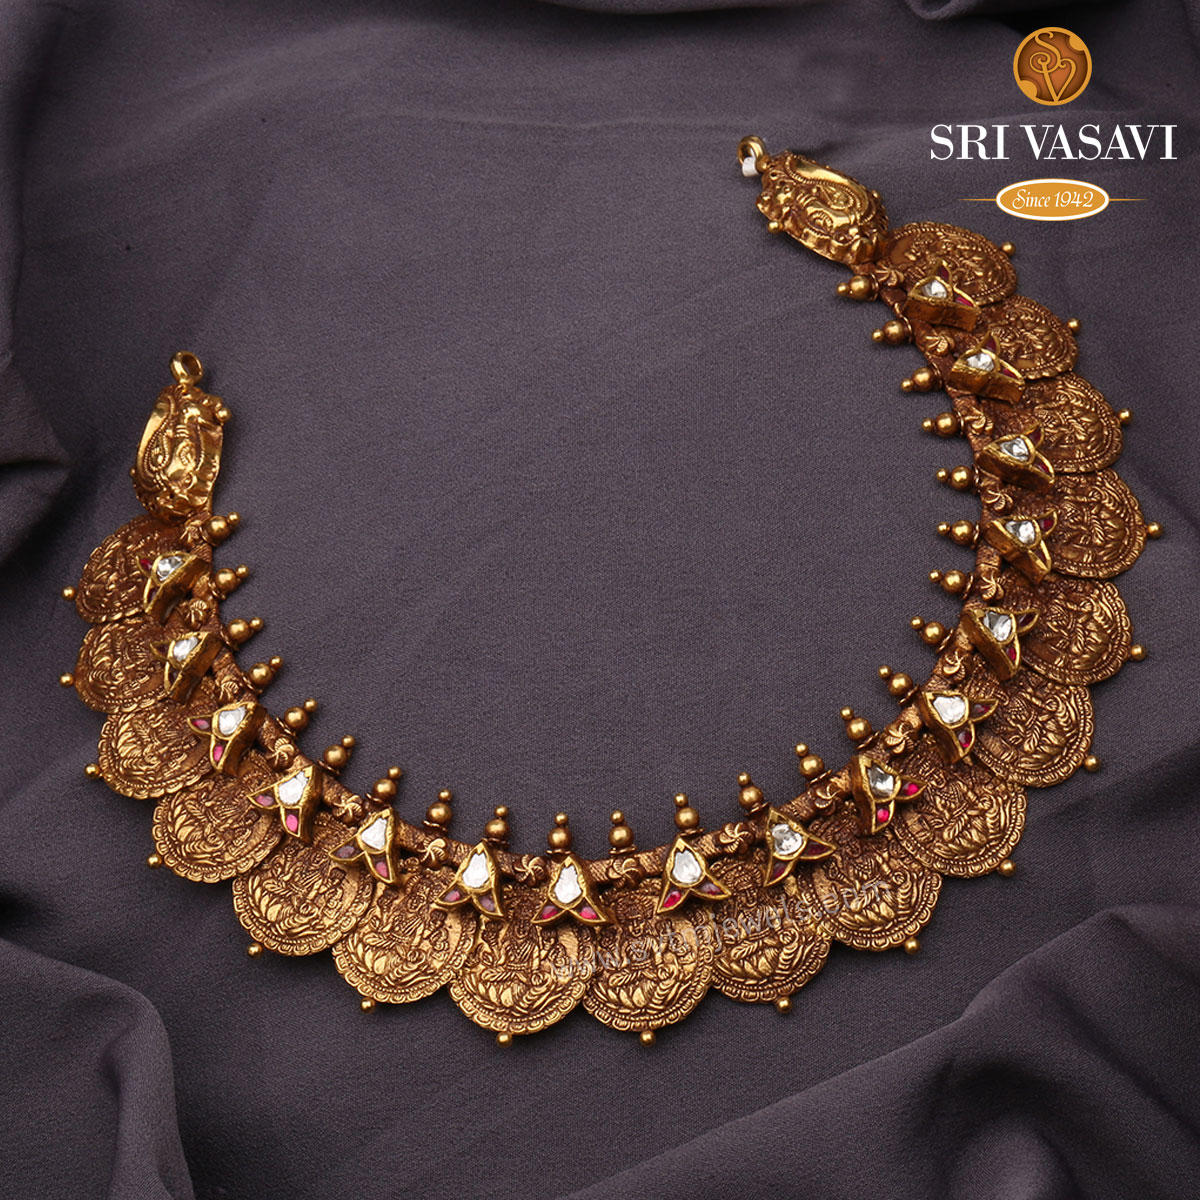 Buddhi Antique Necklace